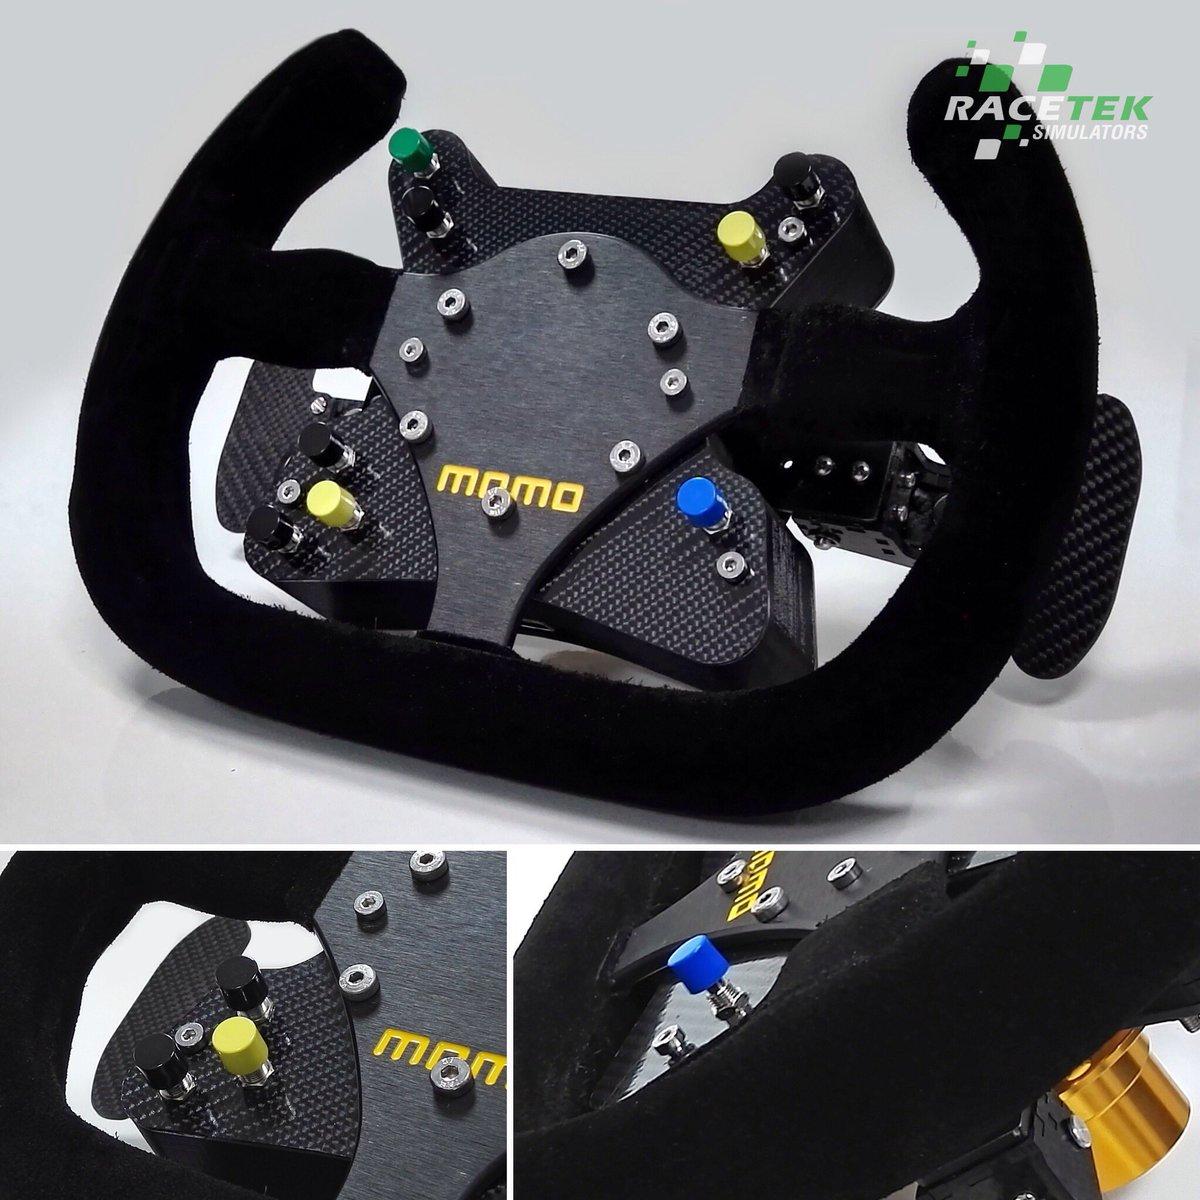 RaceTek Simulators on Twitter: